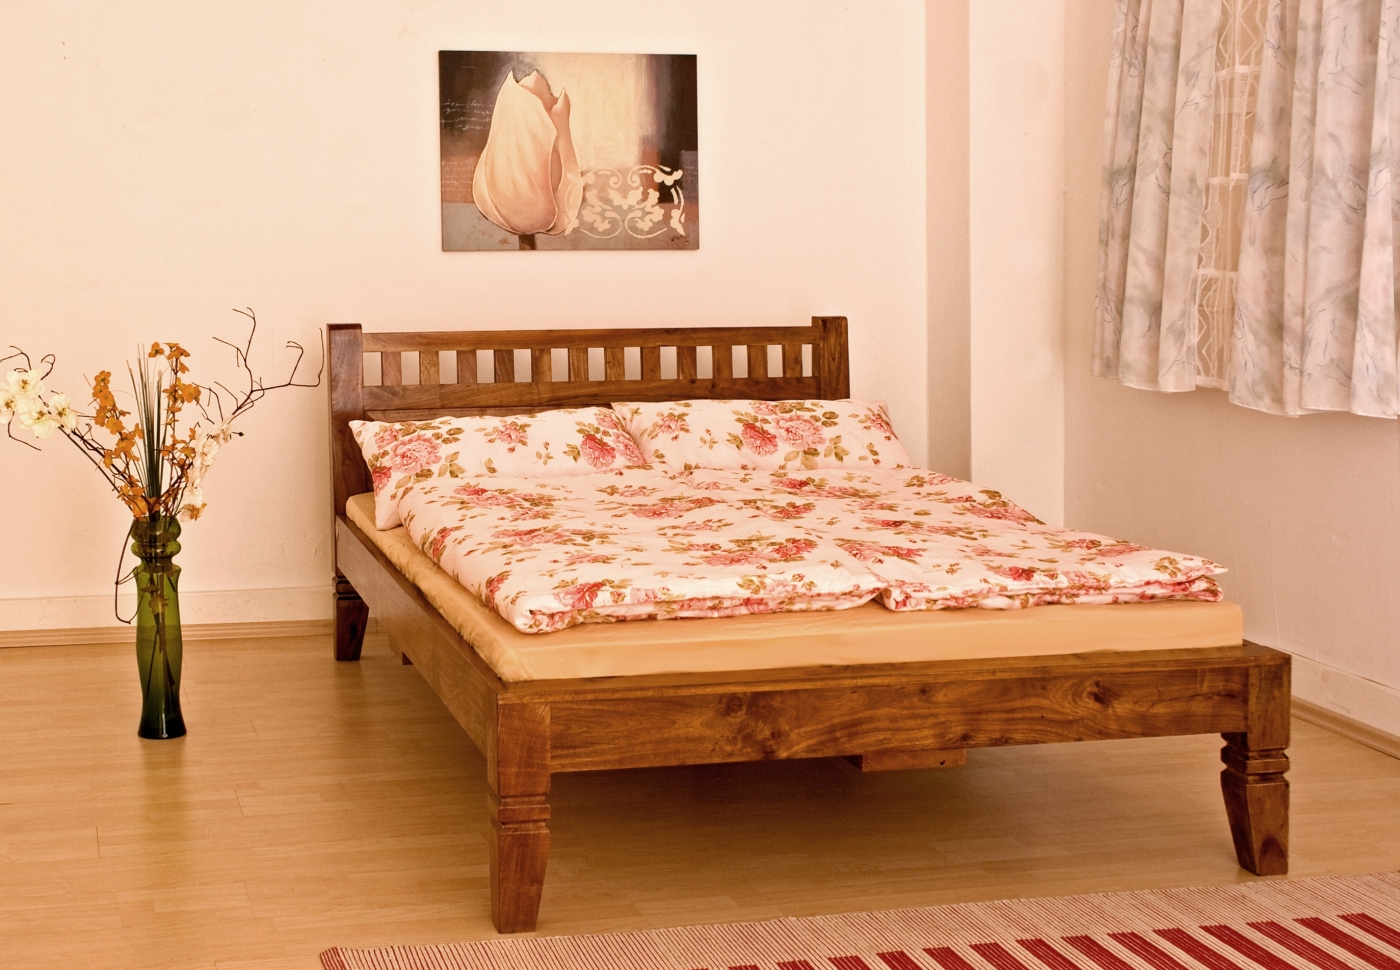 Full Size of Massivholz Bett In Farbe Nougat Honig Aus Edlem Akazienholz 2m X Metall Kinder Betten Clinique Even Better Make Up Foundation Tojo V Hülsta 100x200 160x200 Bett Bett Massivholz